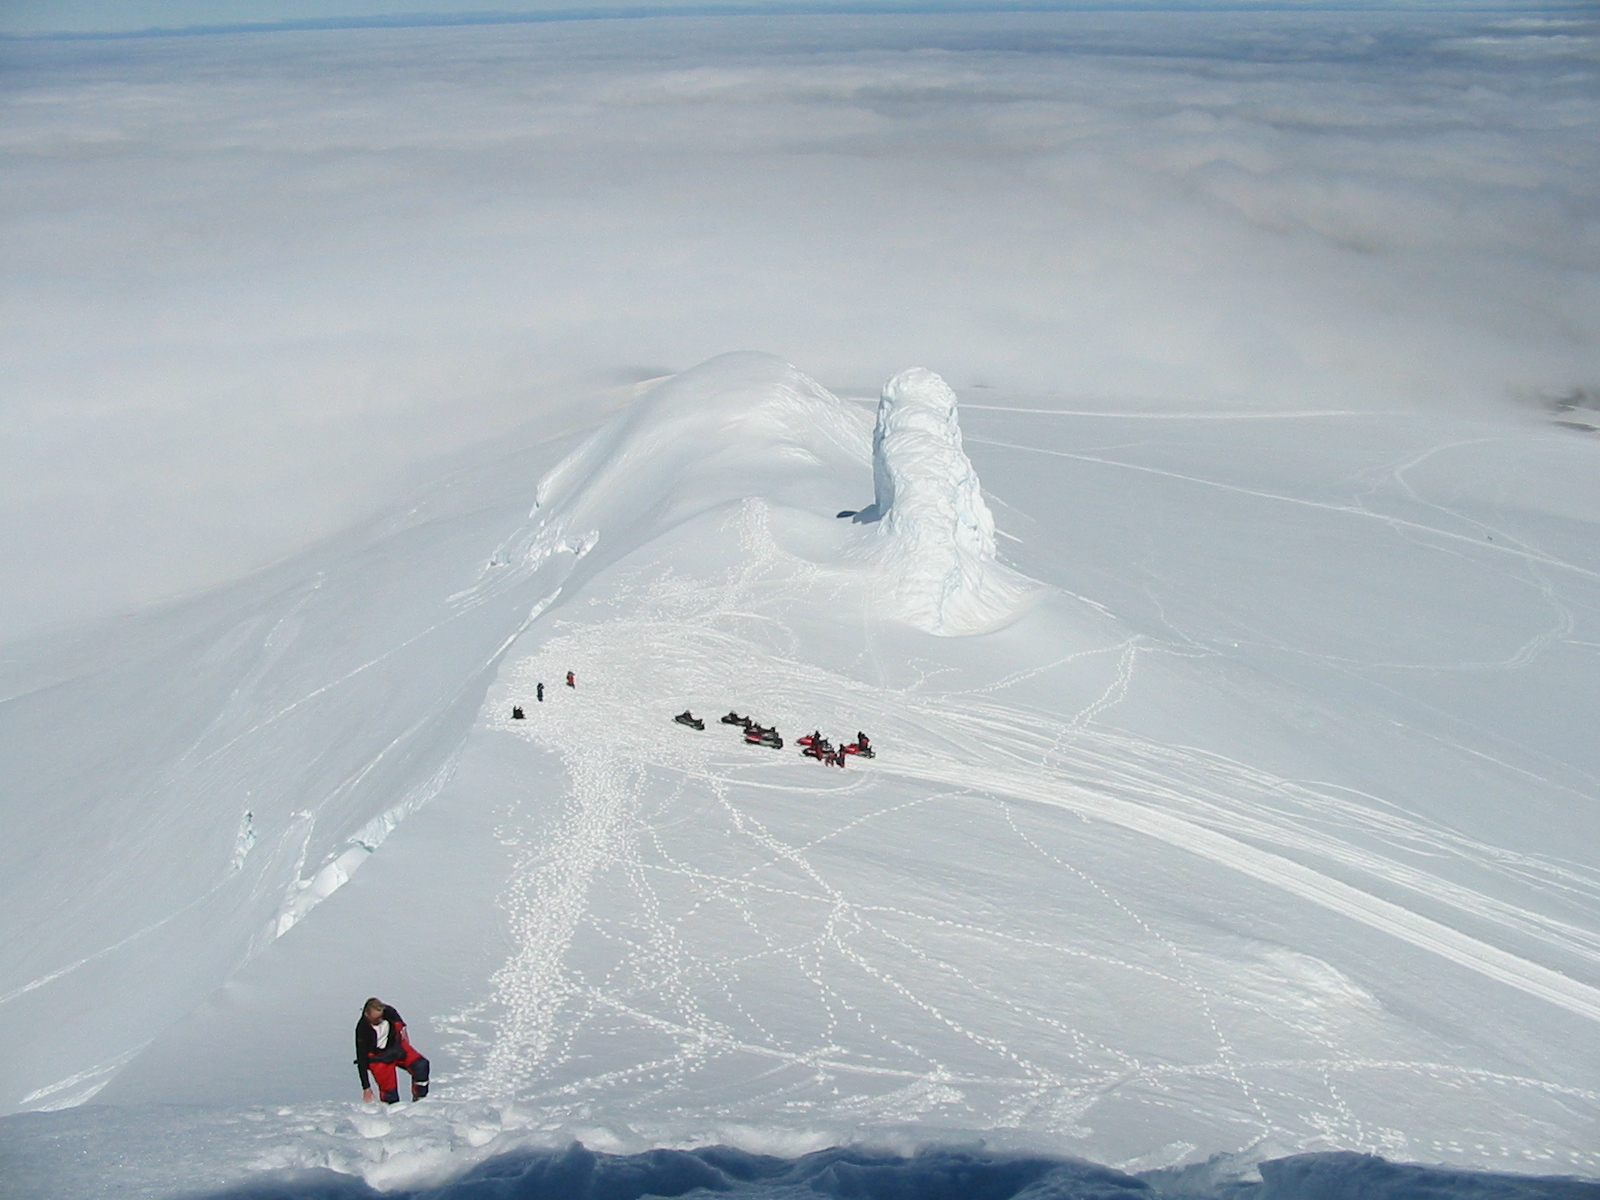 Top of Snaefellsjokul, Snjofell